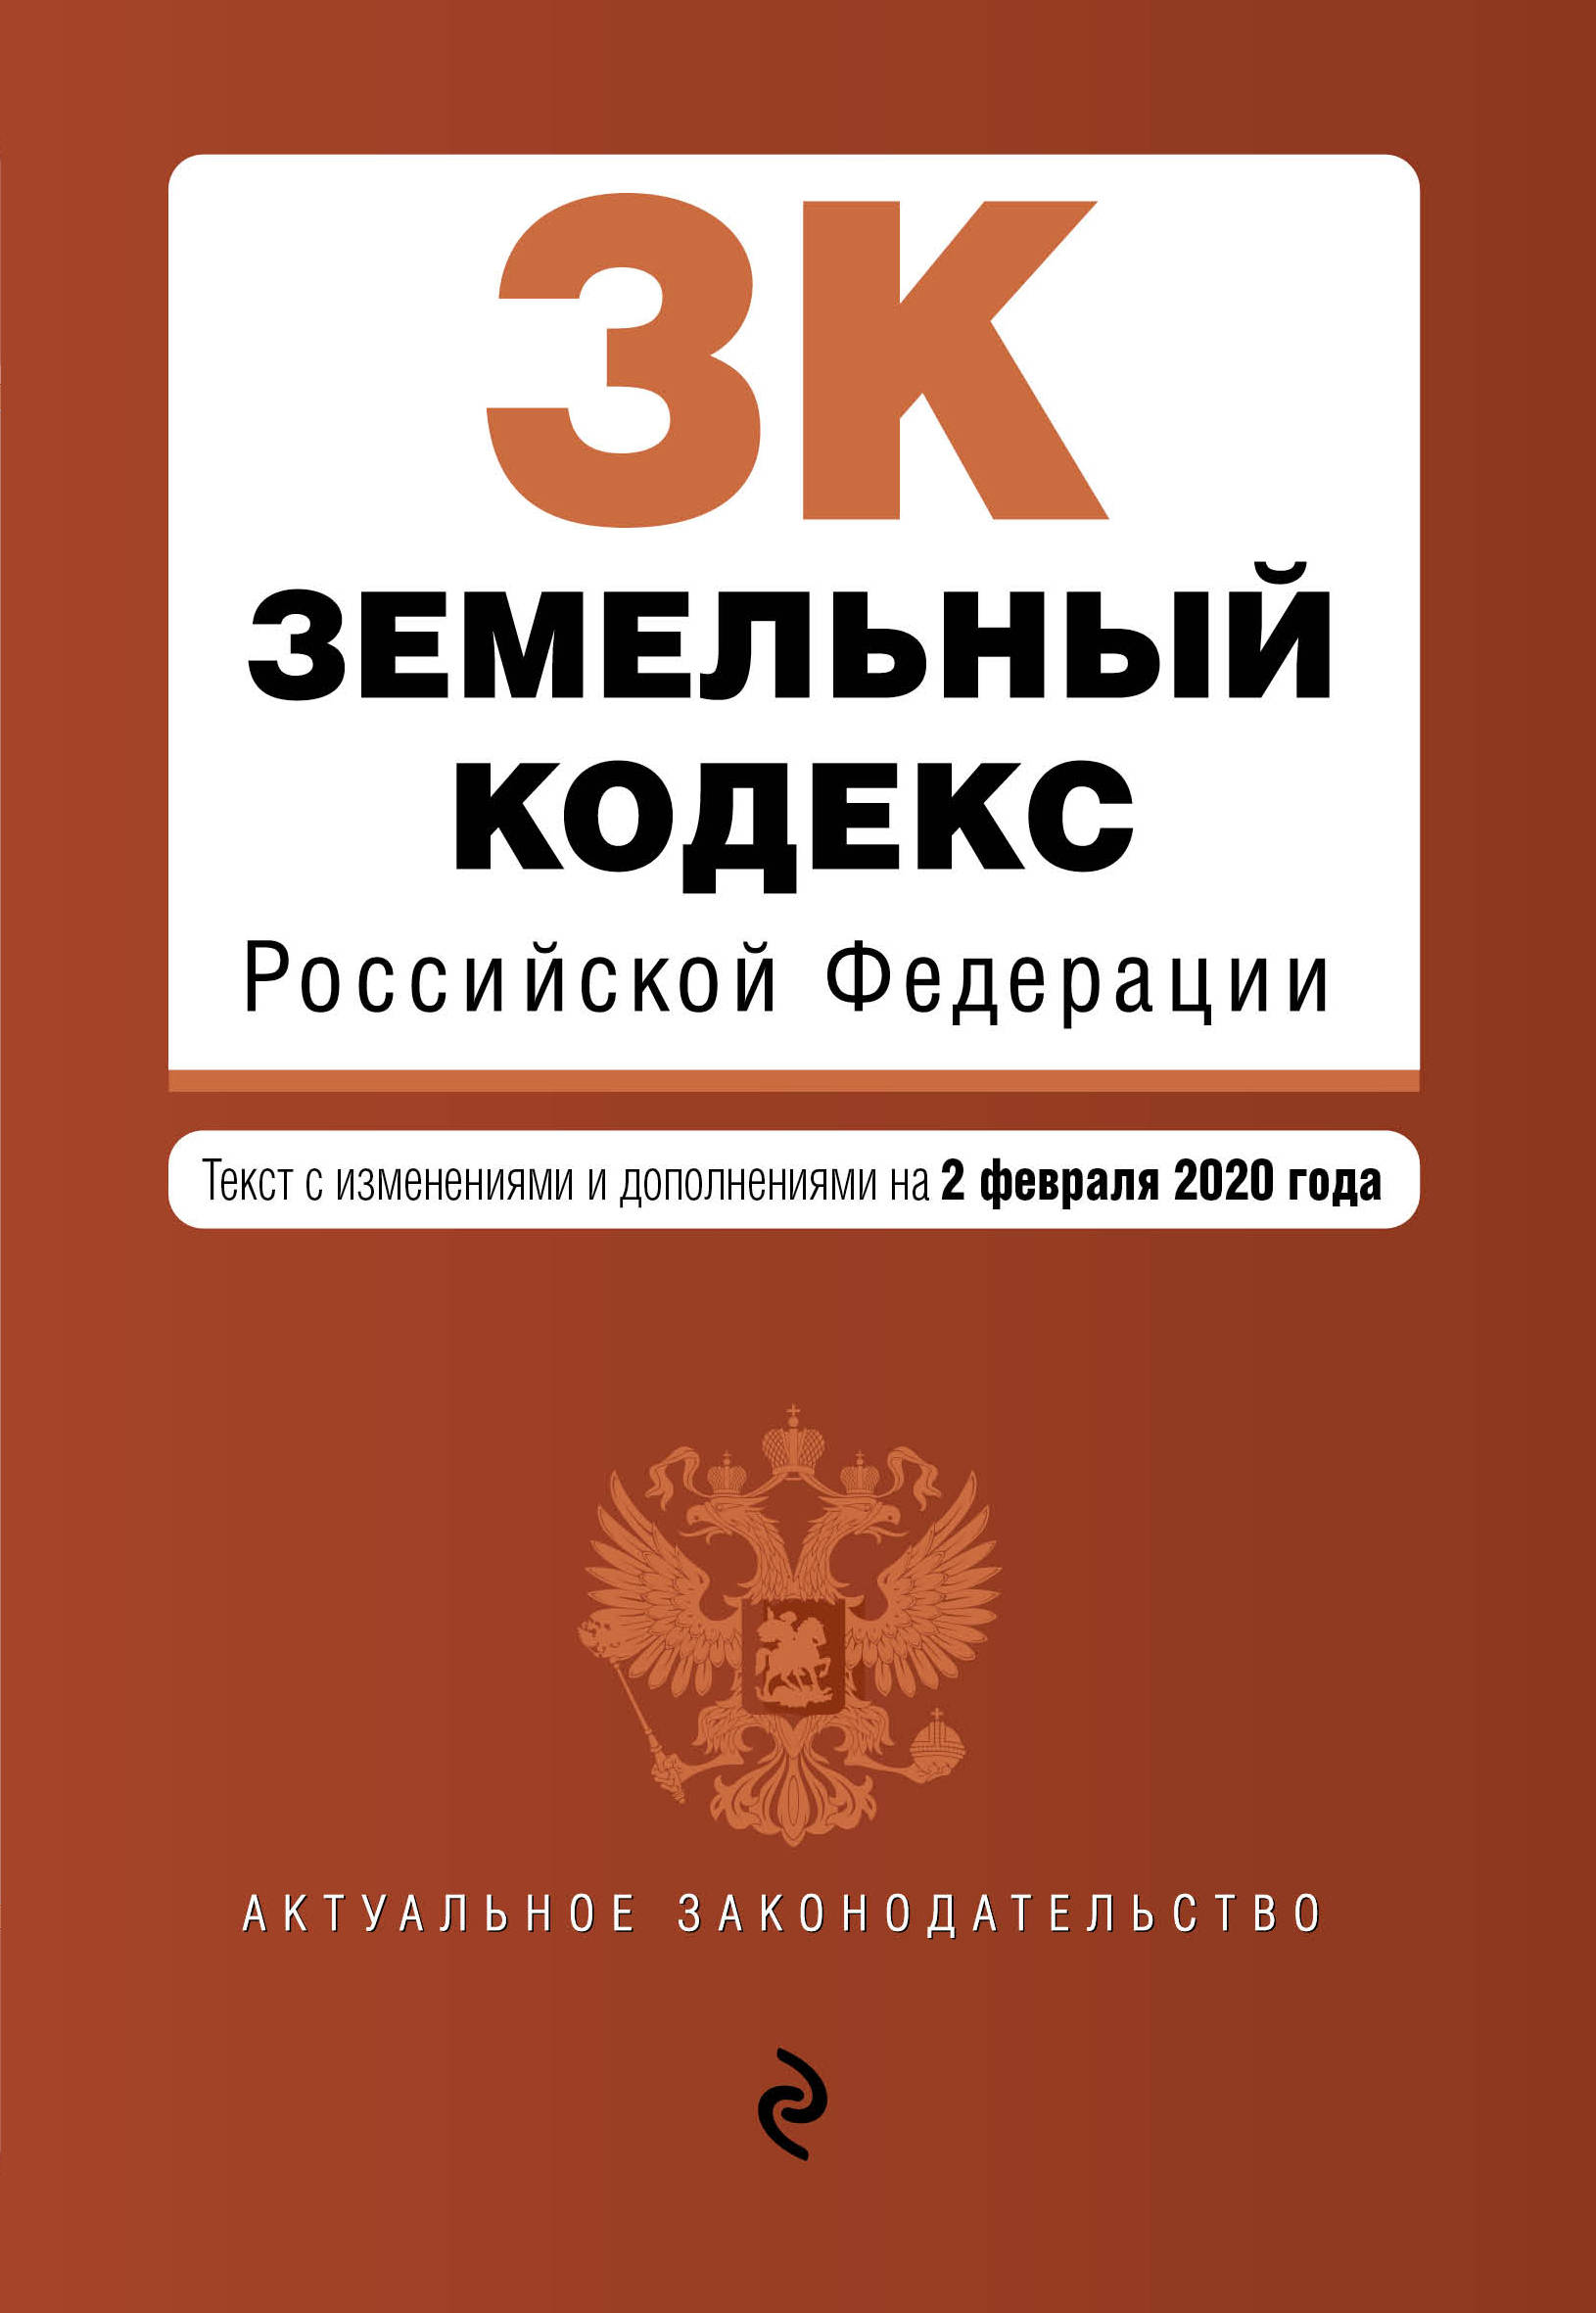 Zemelnyj kodeks Rossijskoj Federatsii. Tekst s izm. i dop. na 2 fevralja 2020 g.